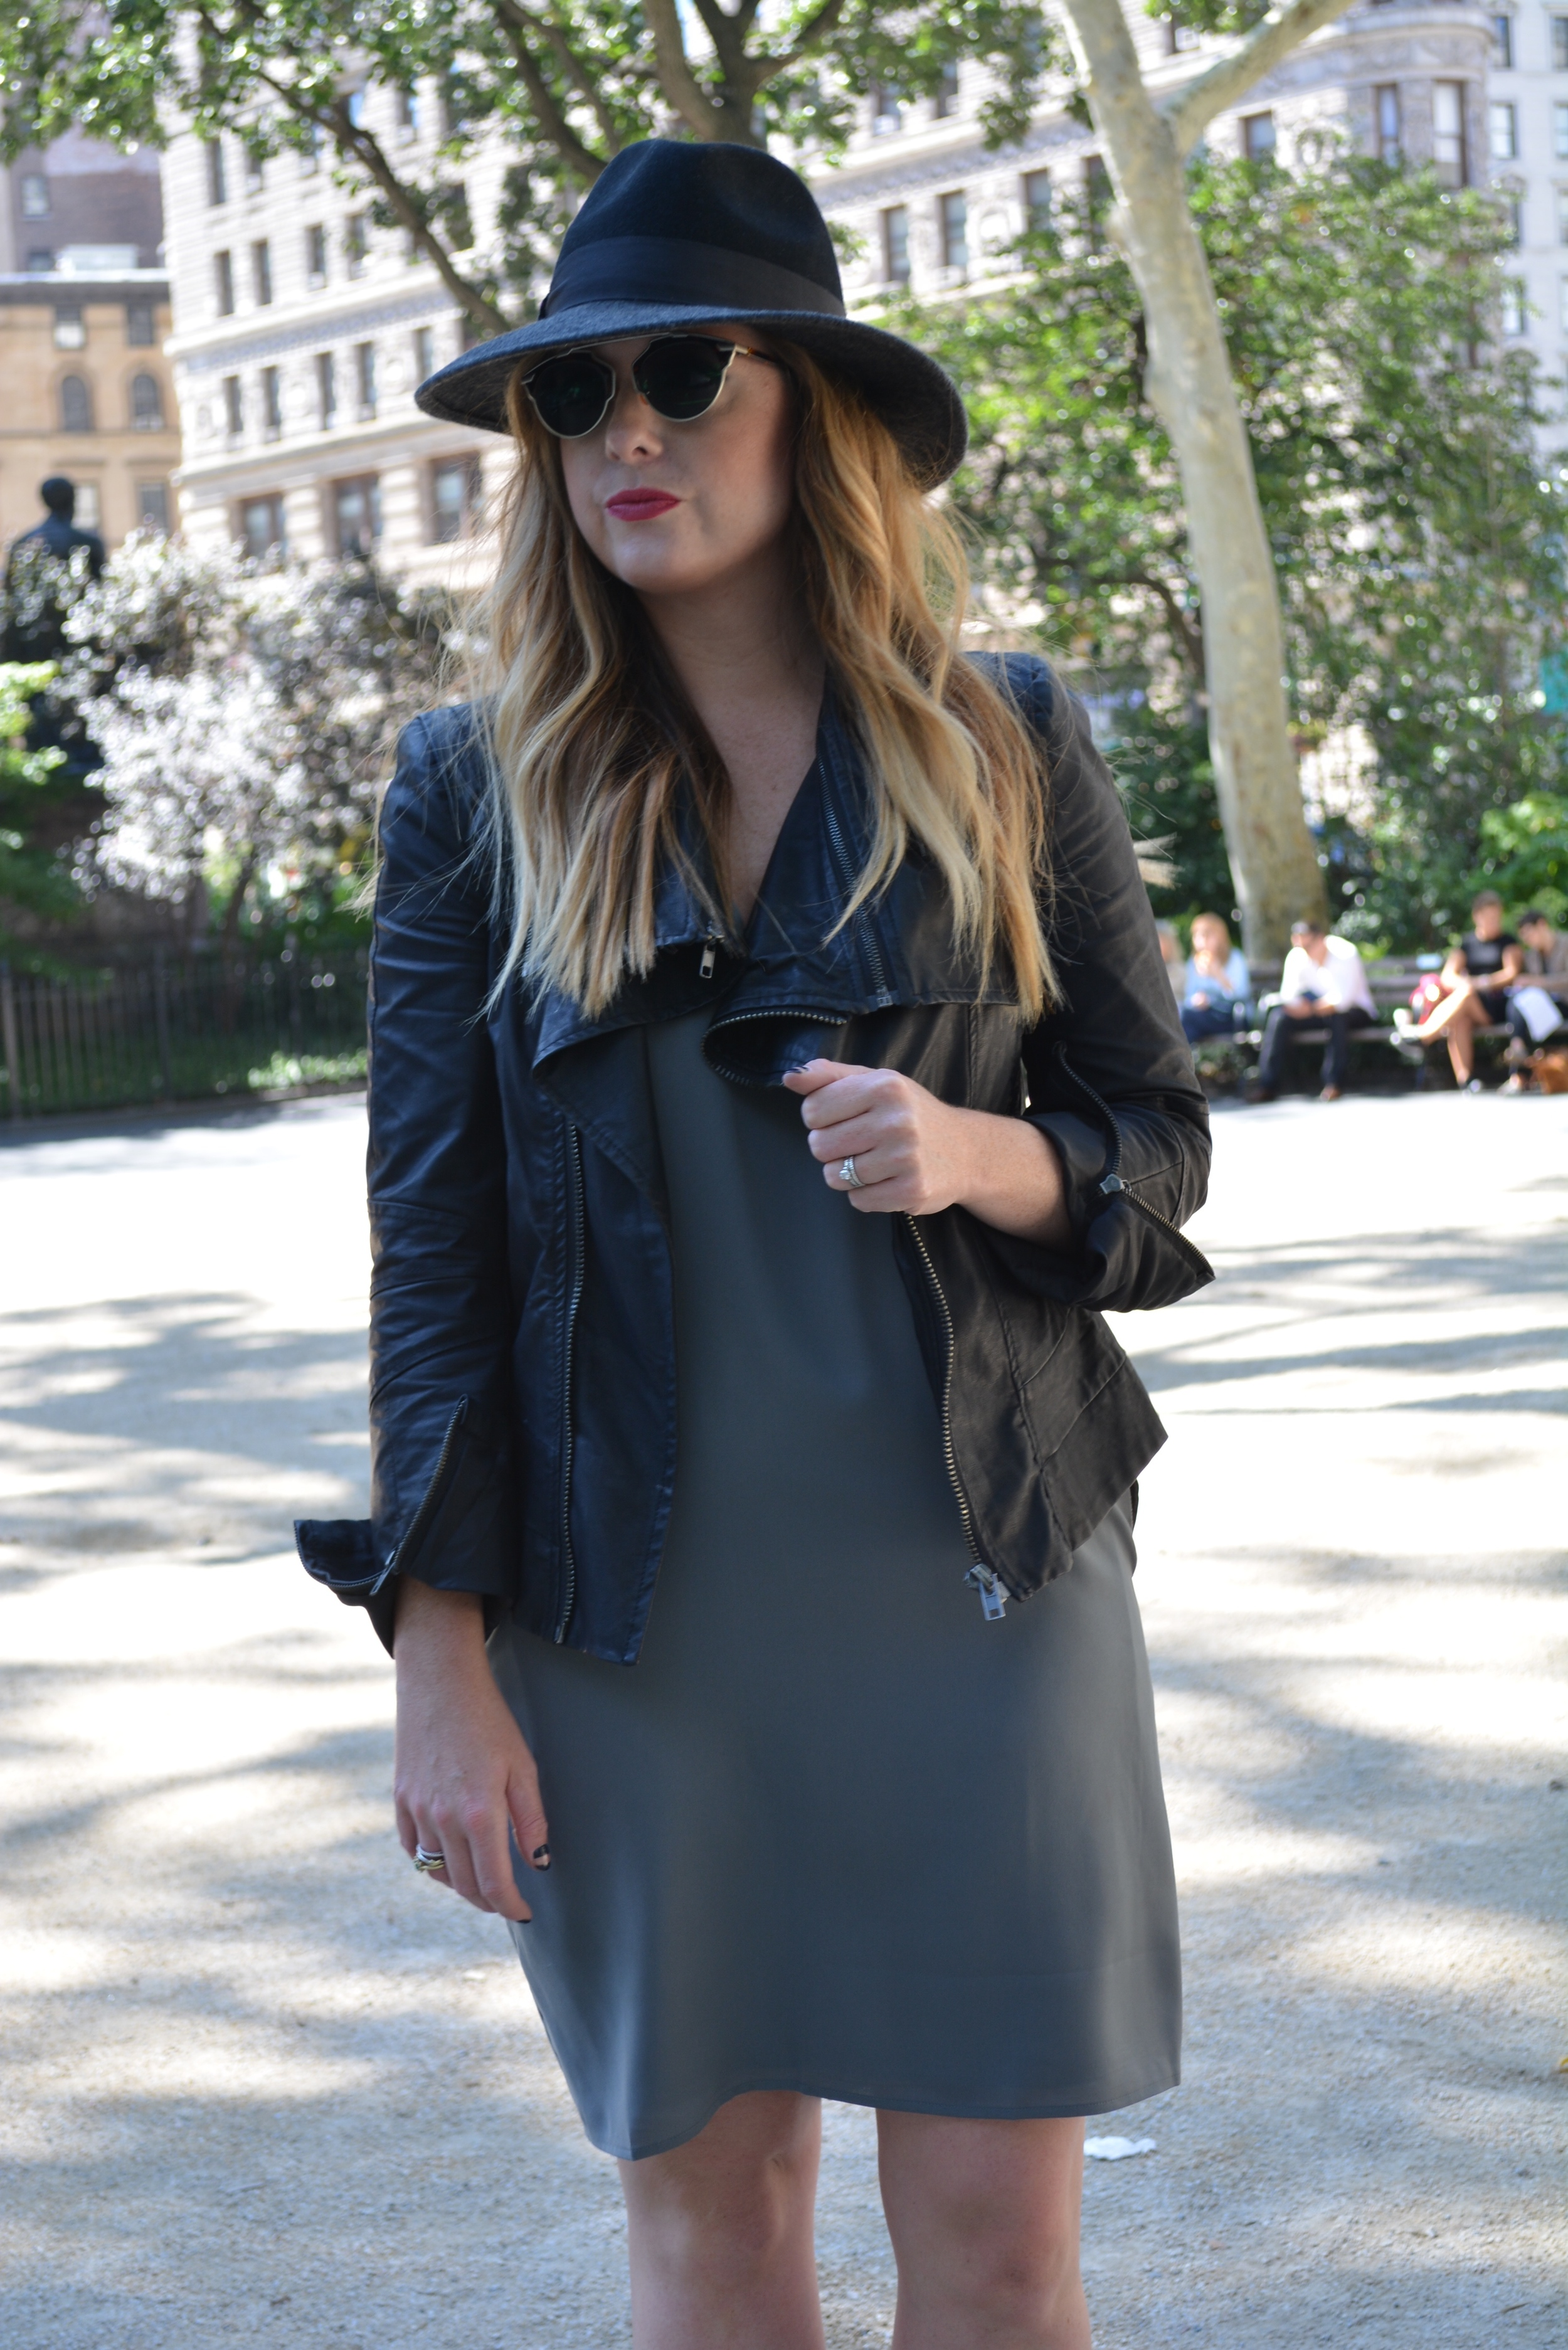 Moto jacket, shift dress outfit